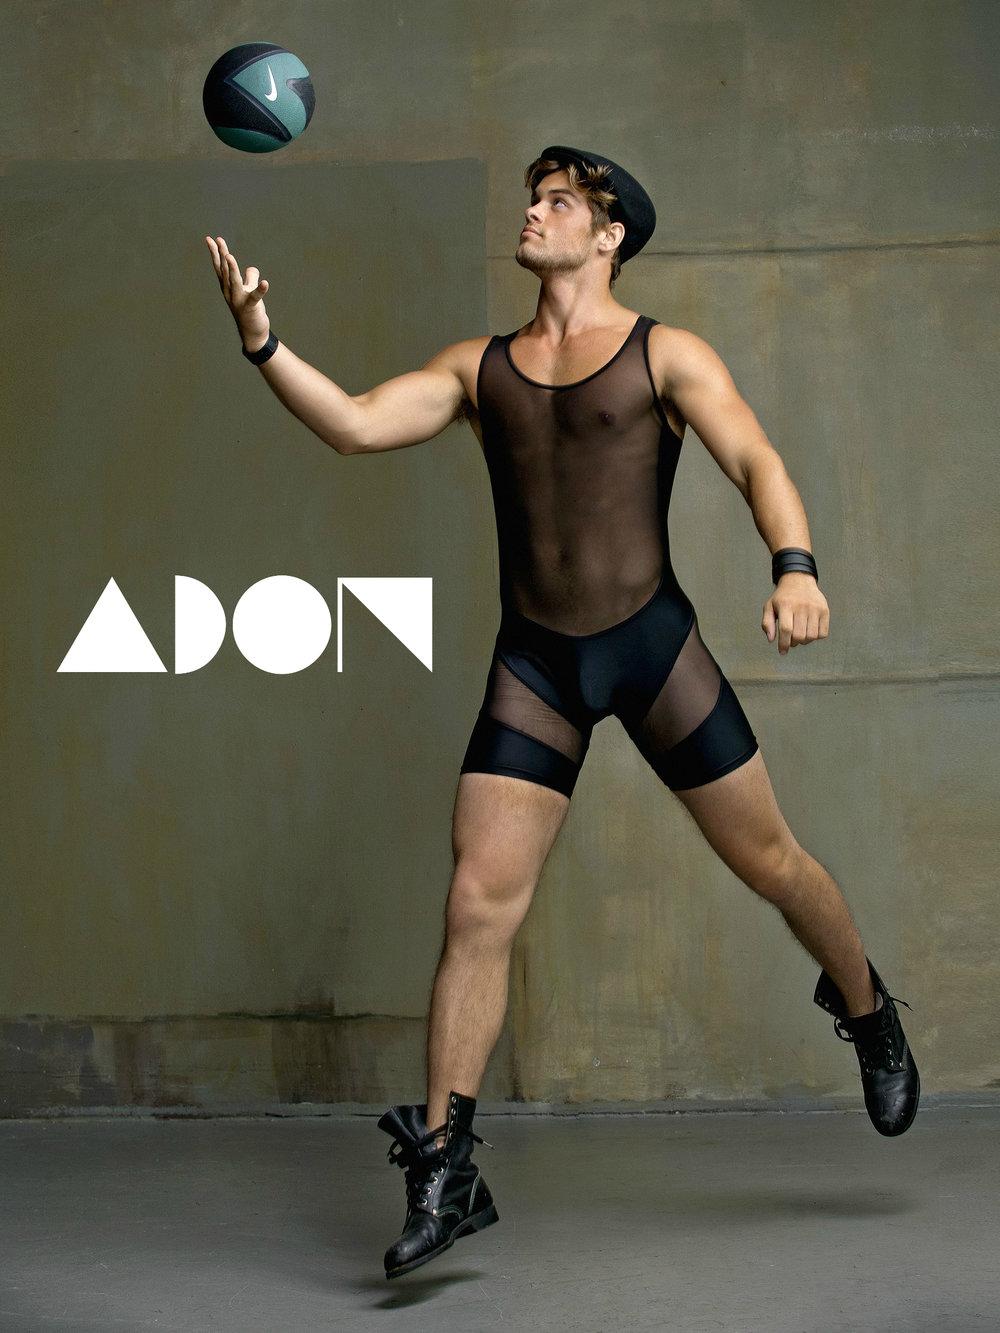 Onesie: N2N Bodywear Ball: Nike Boots: Army Surplus